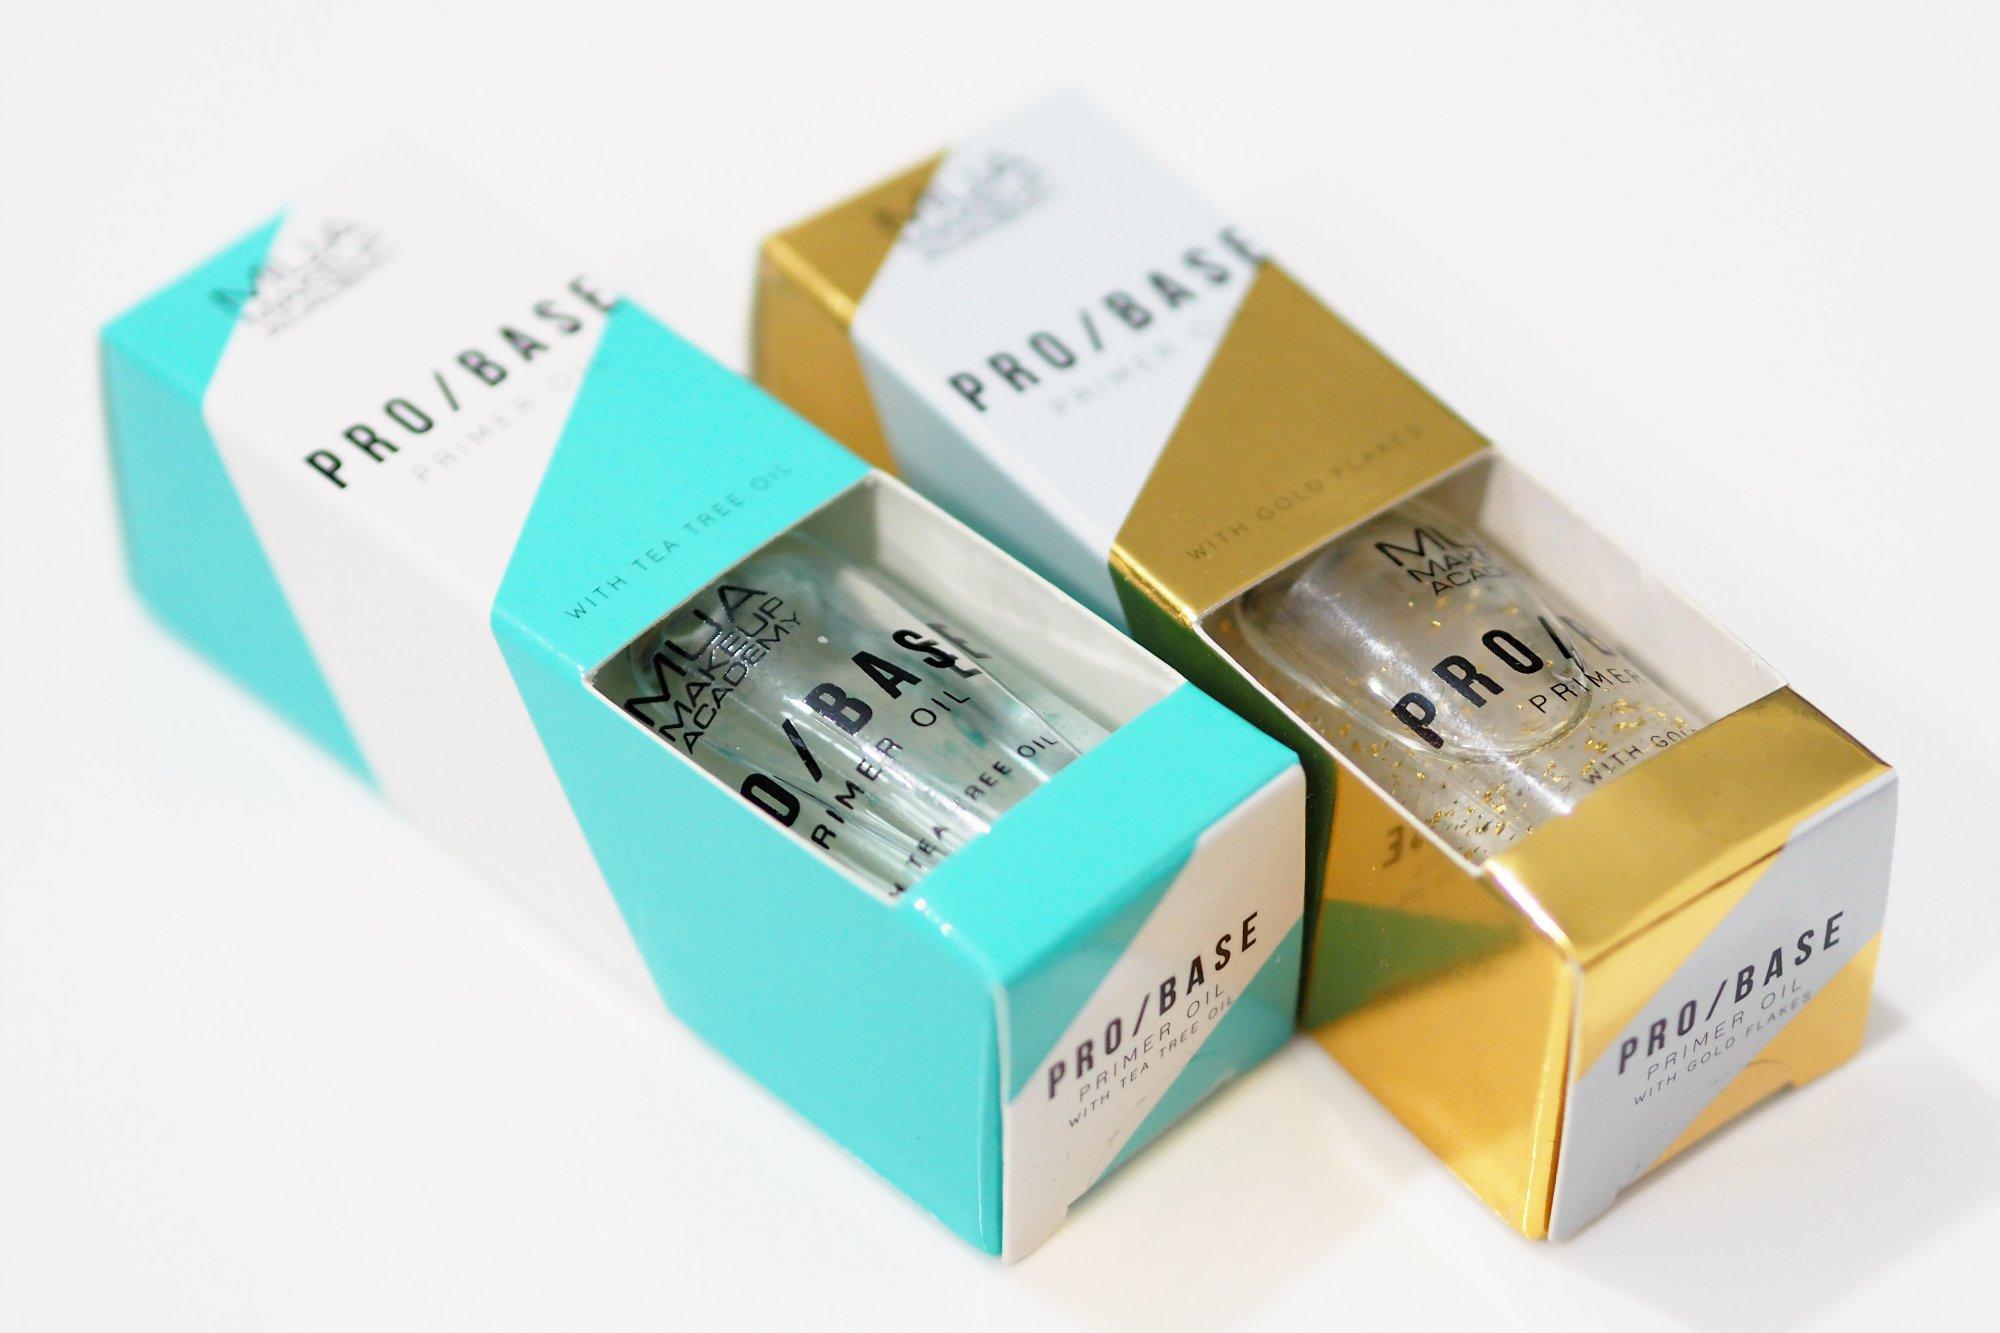 MUA Pro Base Primer Oils - Tea Tree Primer Oil and Gold Flakes Primer Oil Review